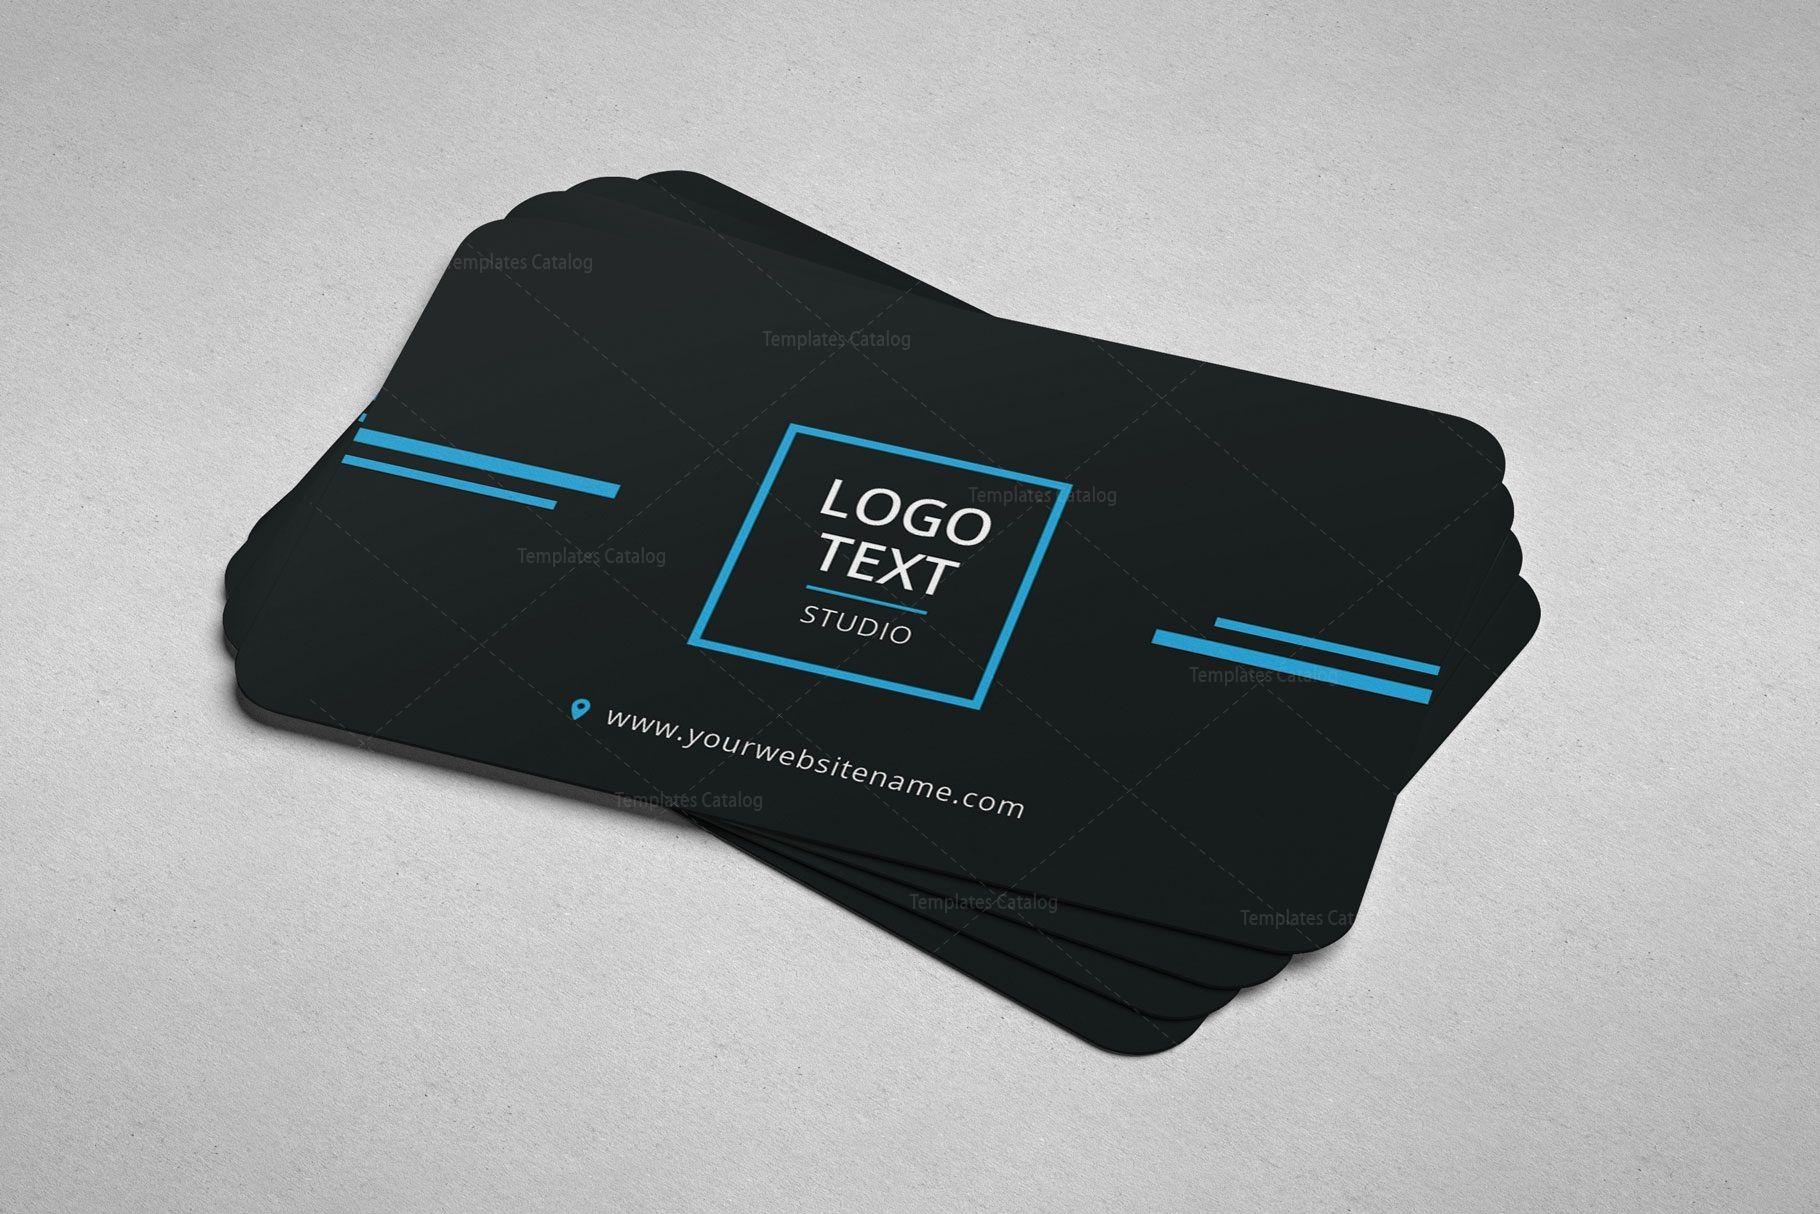 Minimal Programmer Business Card Design Graphic Templates In 2020 Graphic Design Business Card Business Card Design Card Design